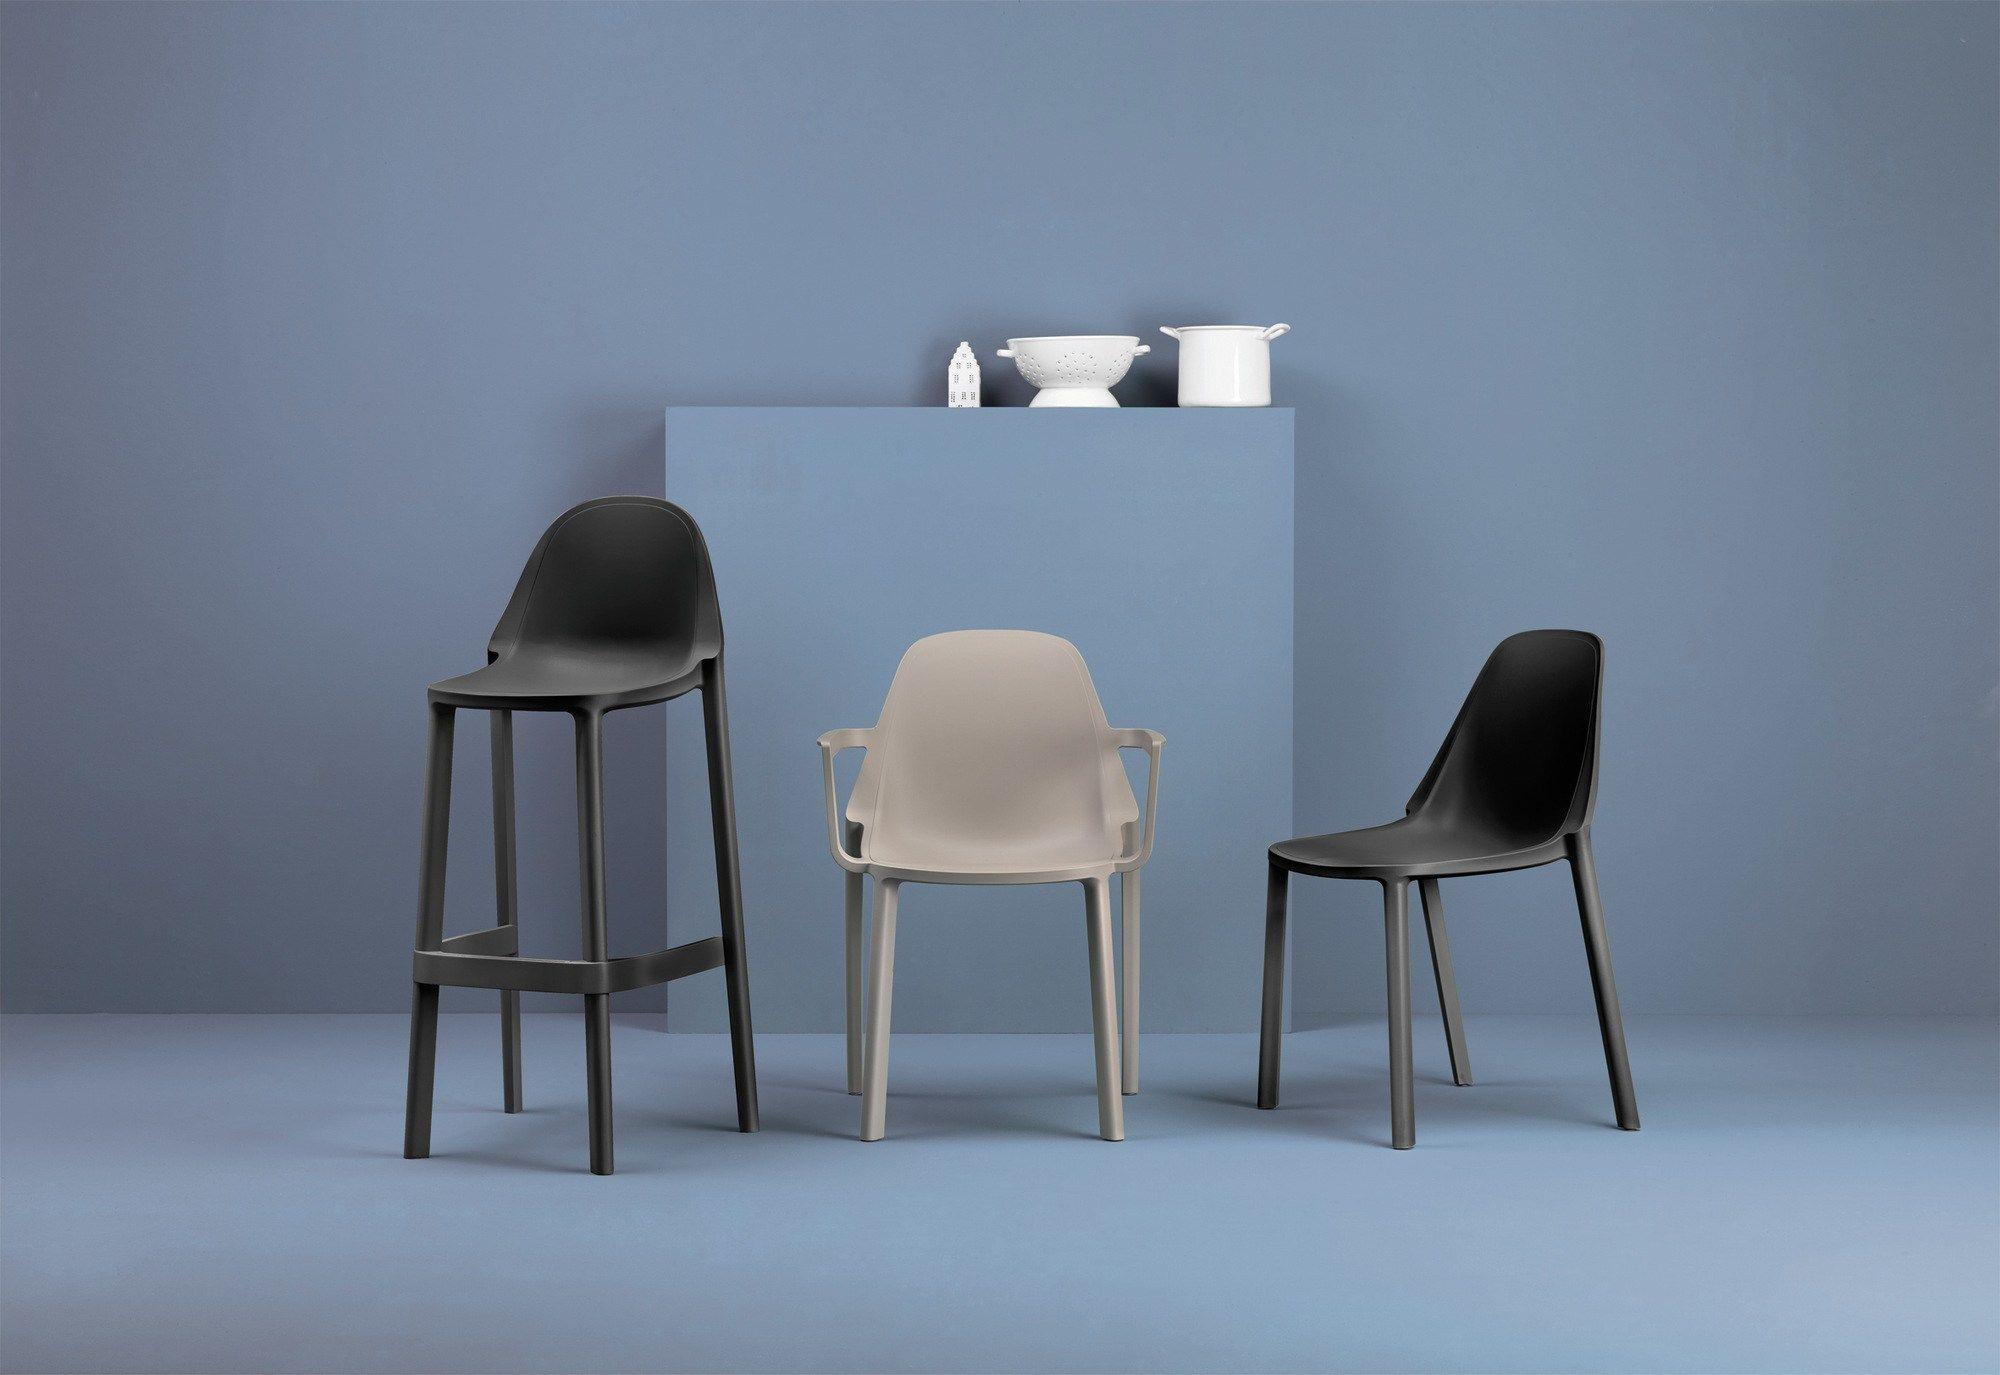 Pi sedia alta by scab design for Sedia alta